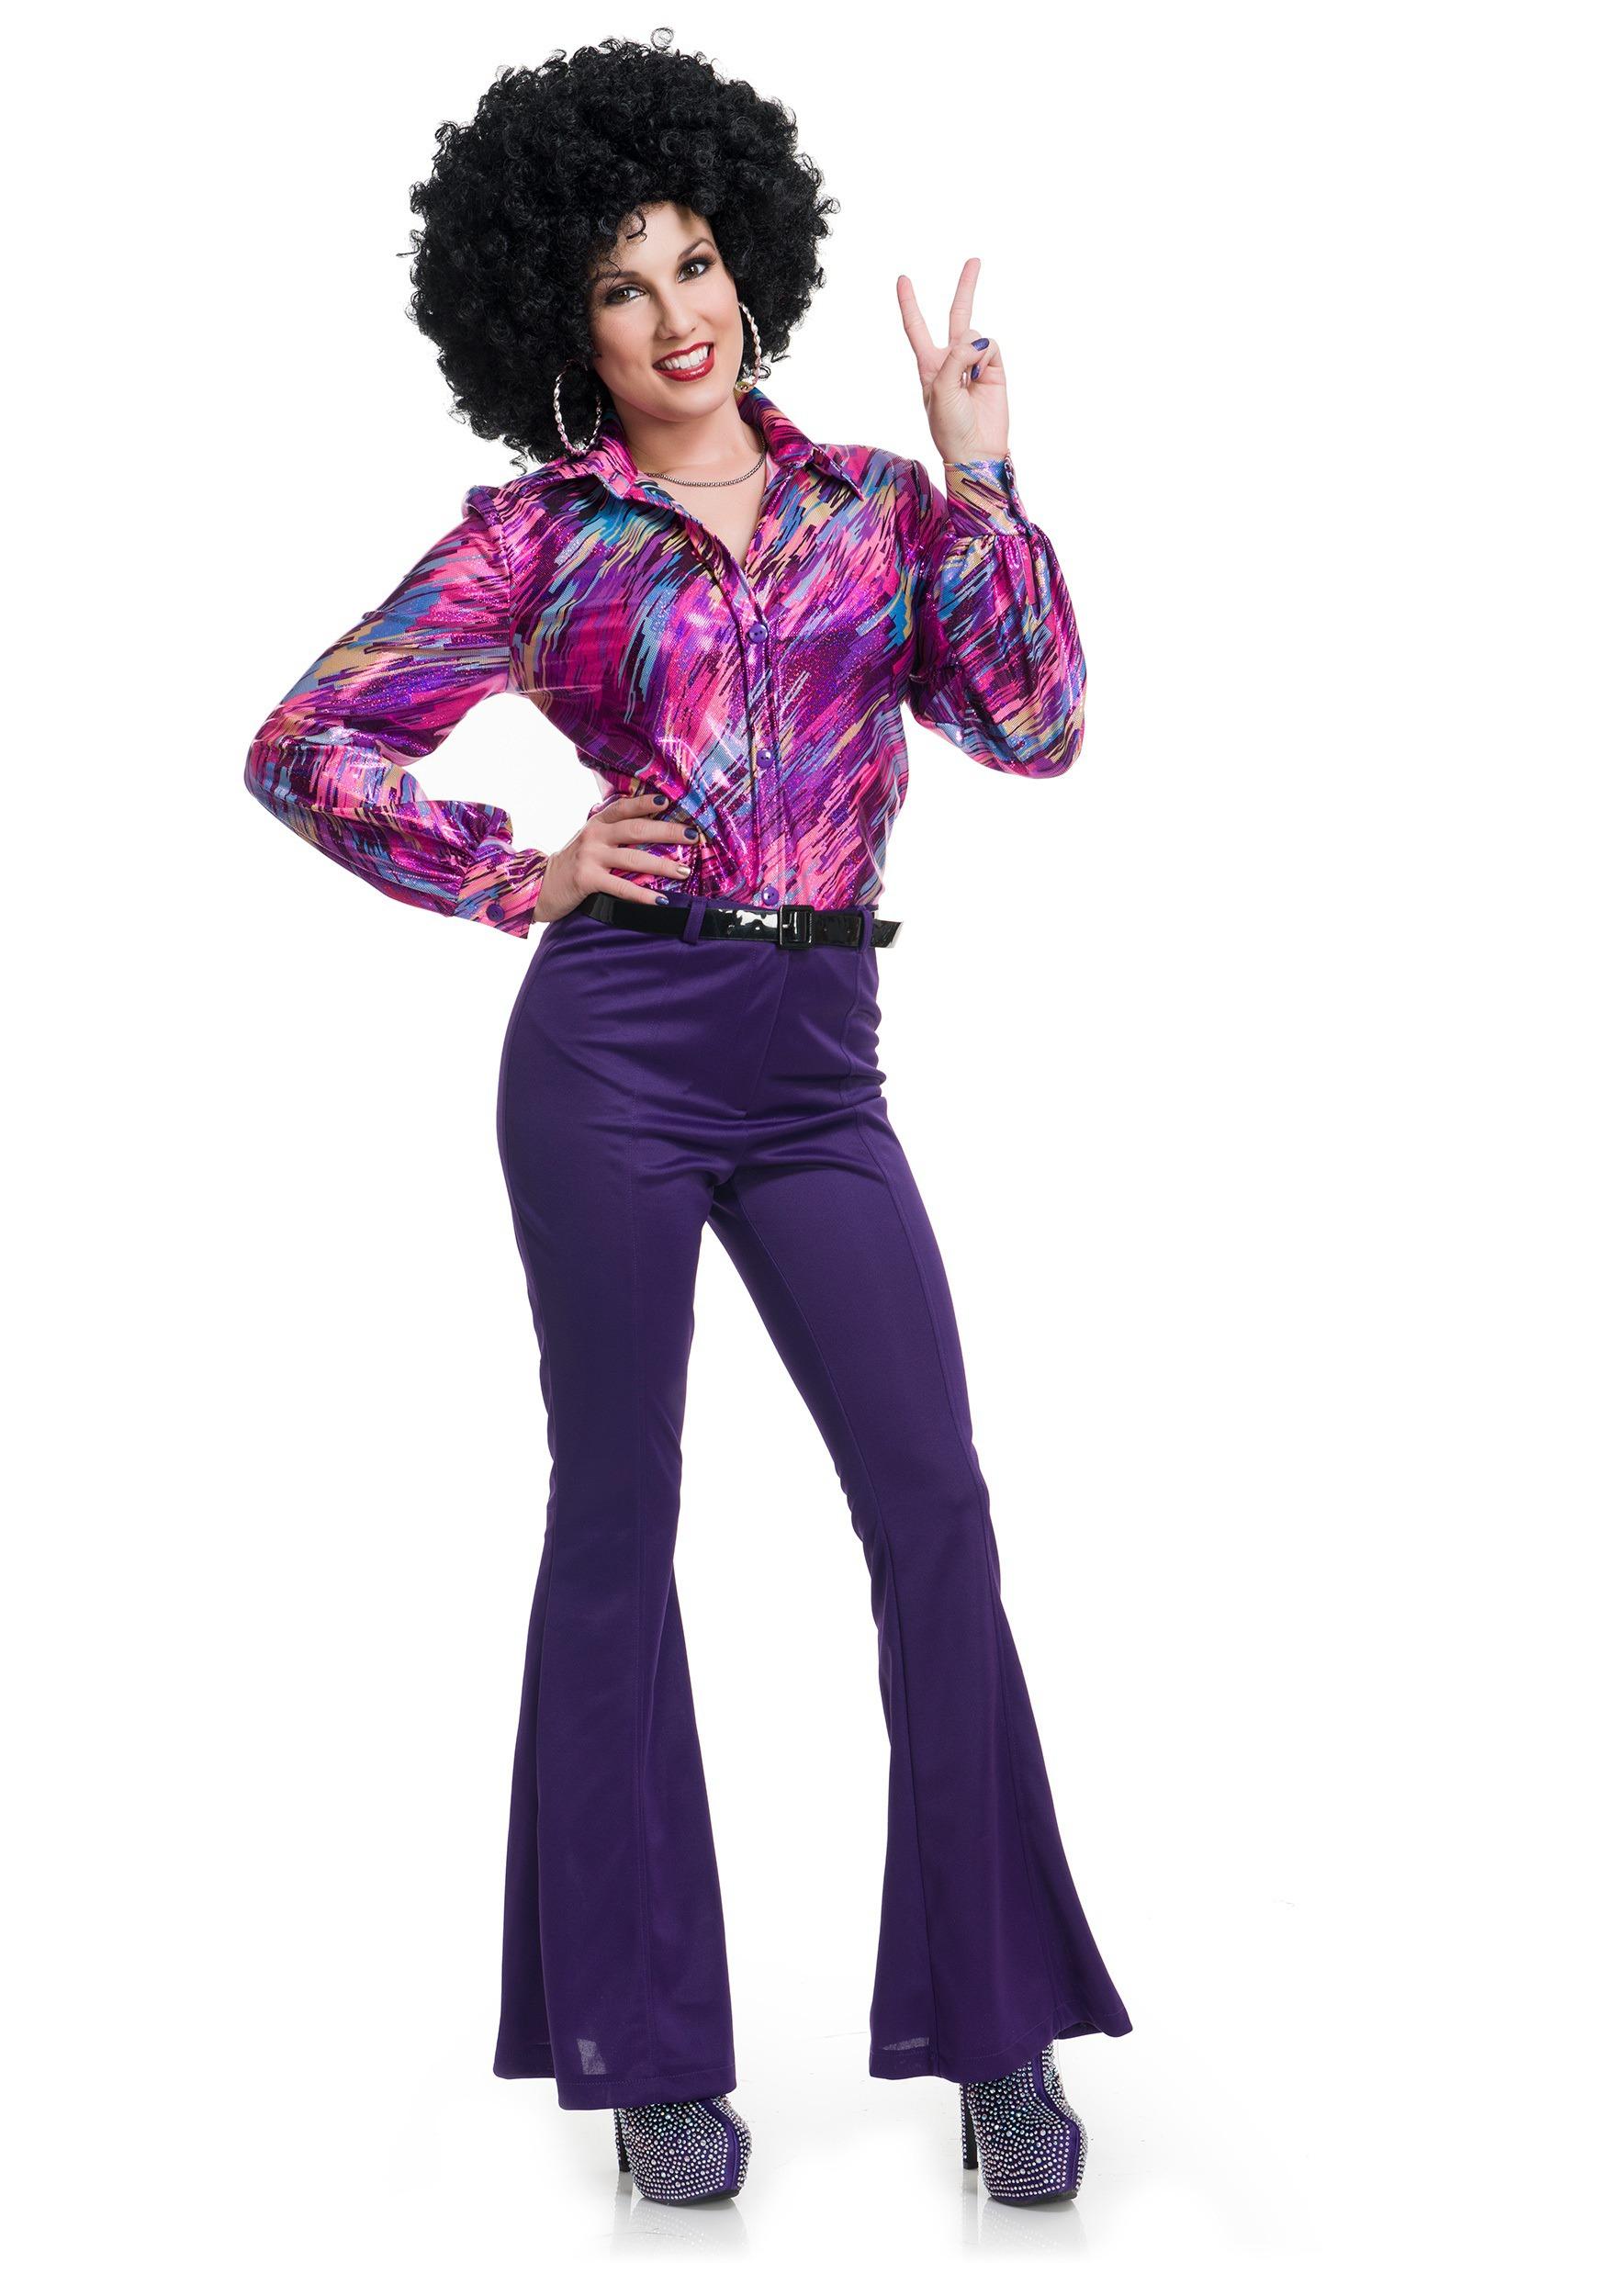 Disco clothes for women